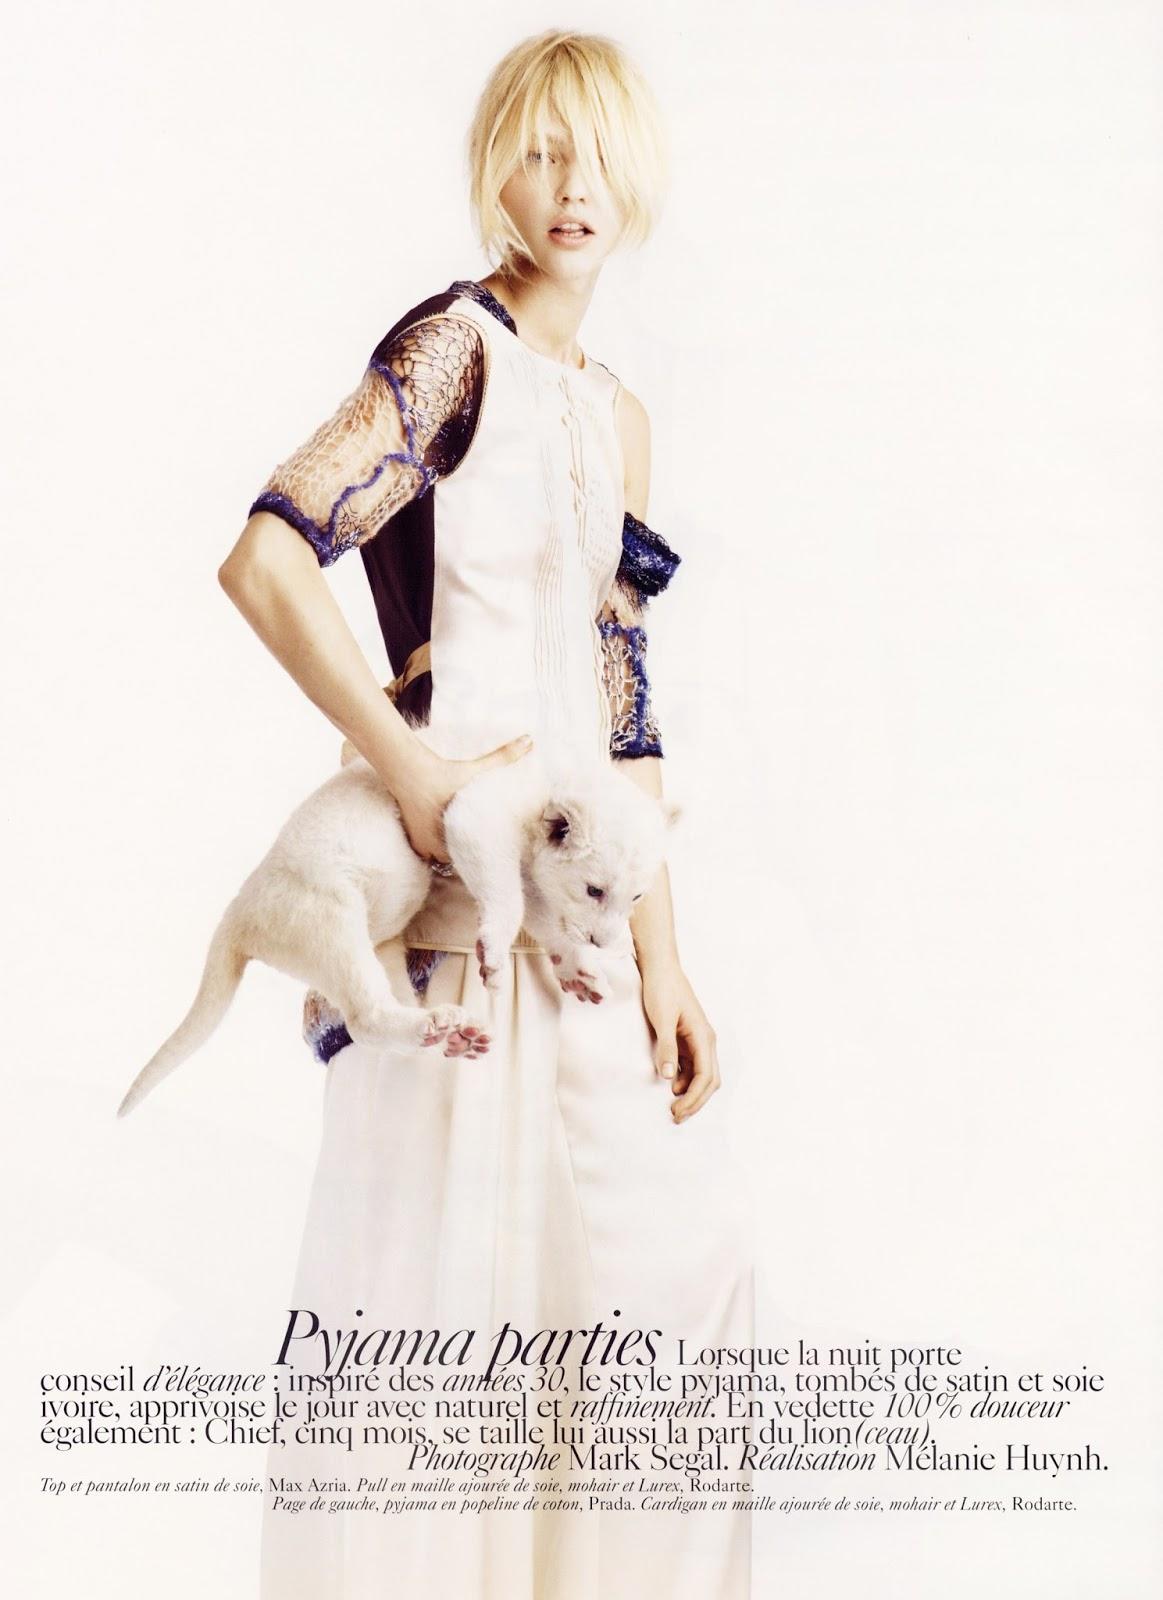 Sasha Pivovarova in Vogue Paris December-January 2007-2008 (photography: Mark Segal, styling: Melanie Huynh)